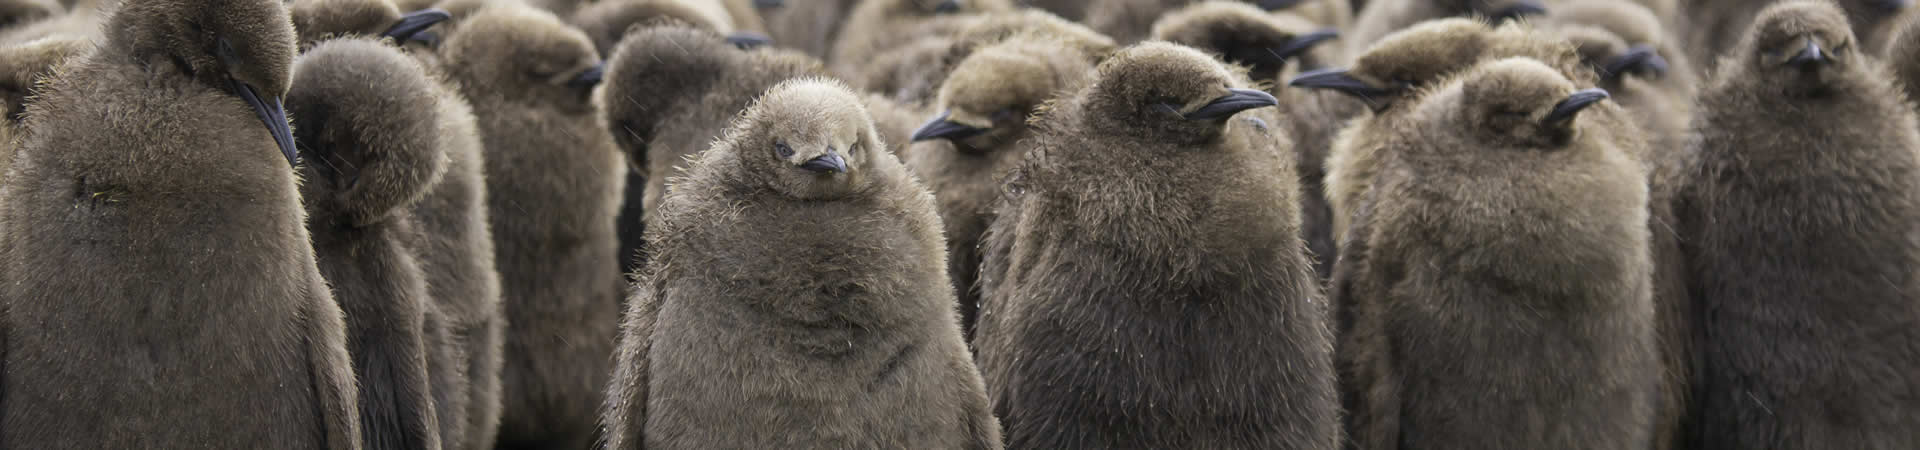 jonge-pinguin